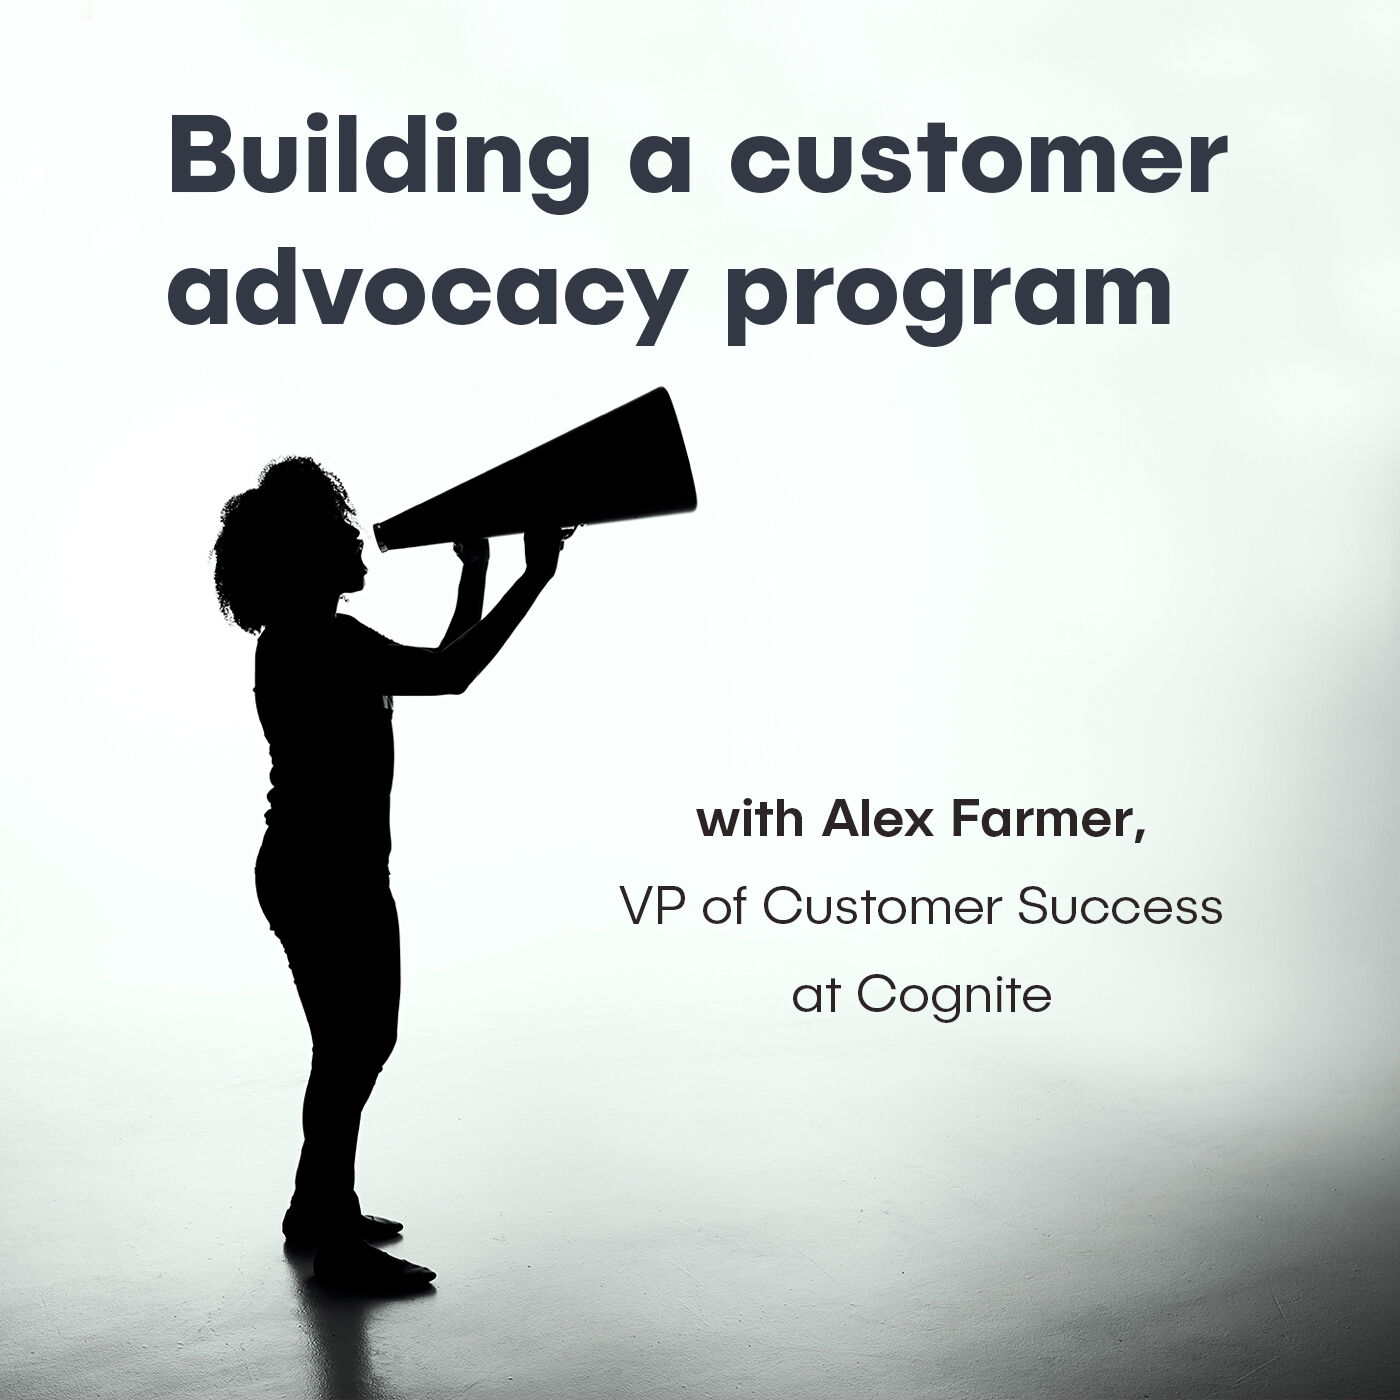 Alex Farmer, VP of Customer Success at Cognite - Building a customer advocacy program